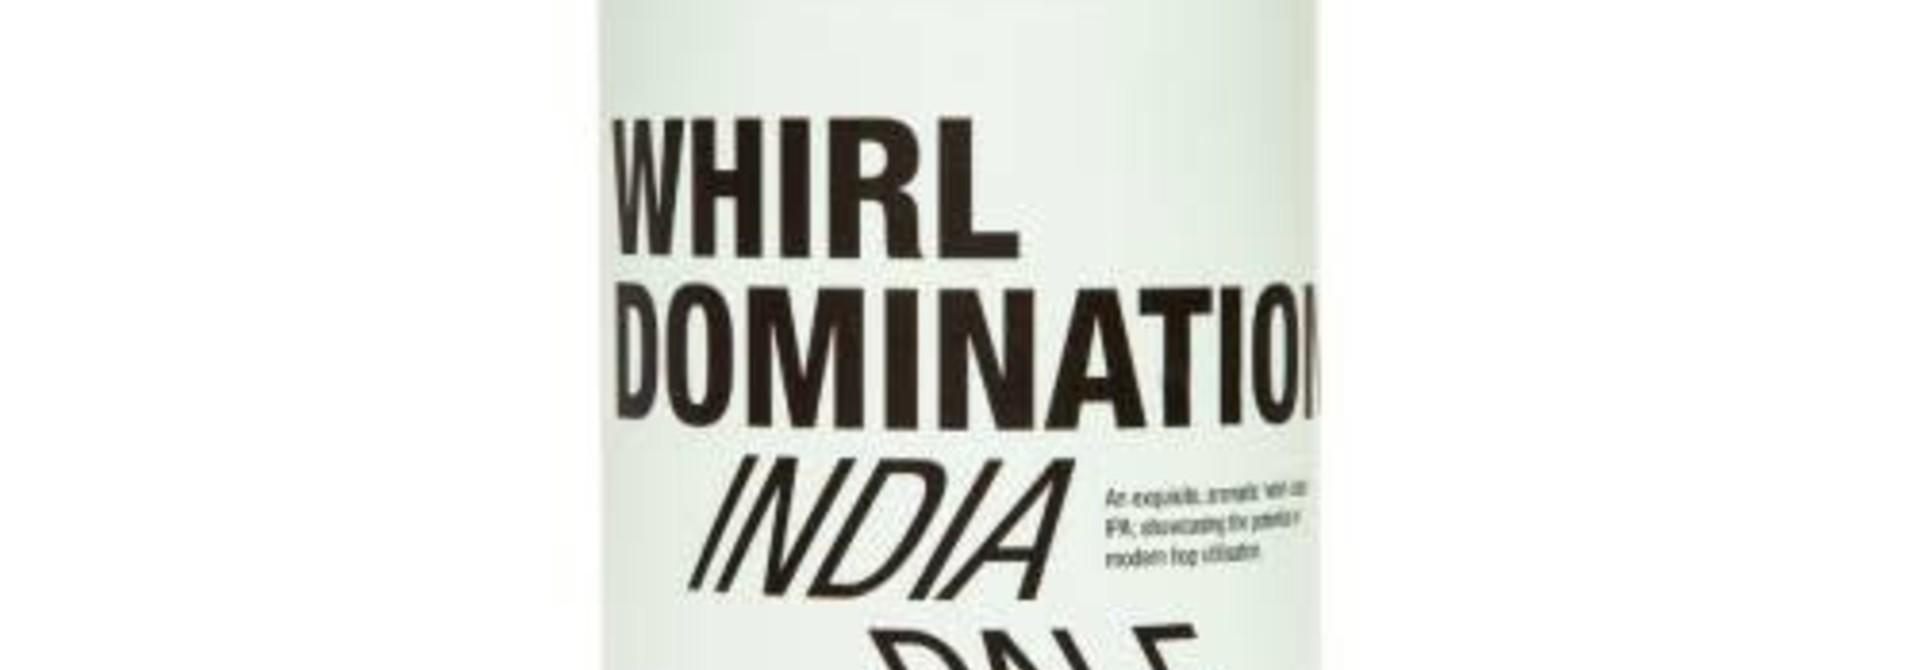 TO OL WHIRL DOMINATION 24/44 BLIK